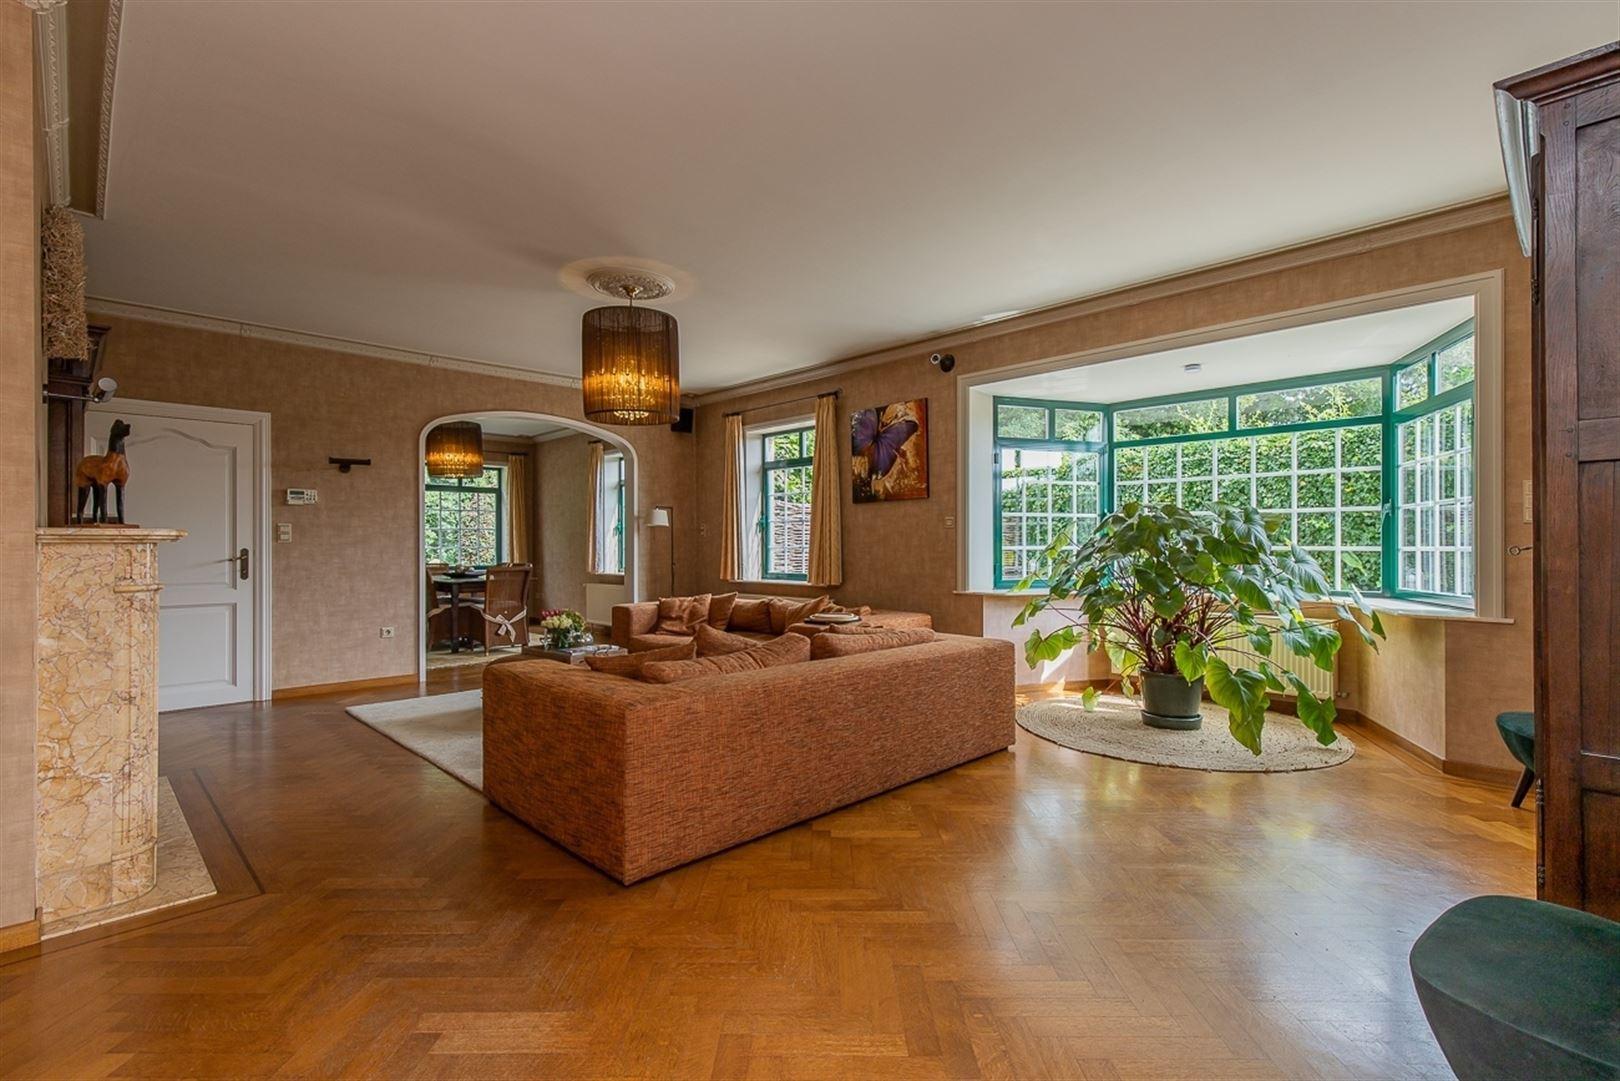 Foto 5 : Woning te 9280 LEBBEKE (België) - Prijs € 469.000